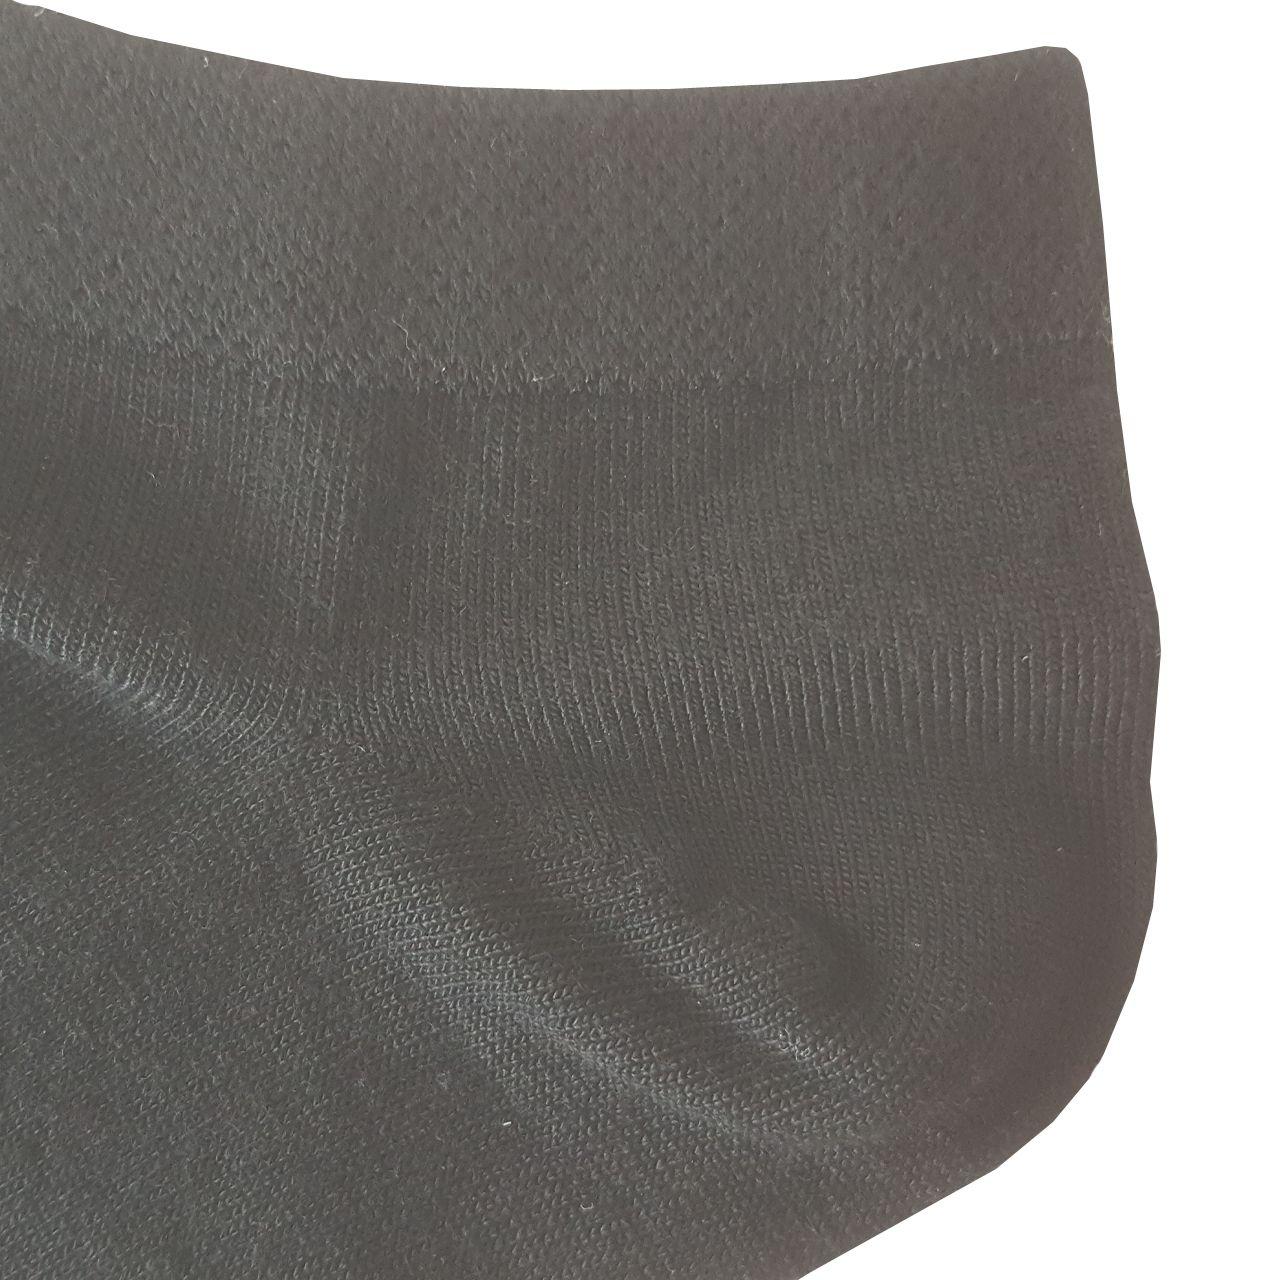 جوراب زنانه ال سون کد PH414 -  - 4